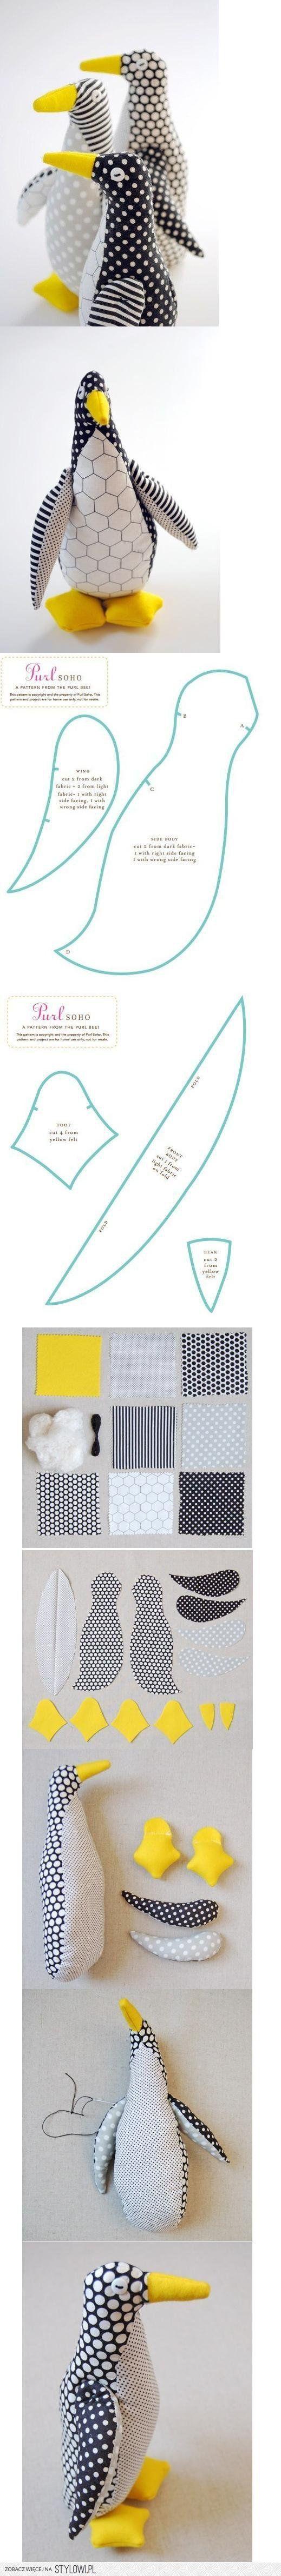 DIY Fabric Penguin DIY Projects   UsefulDIY.com   costura ...